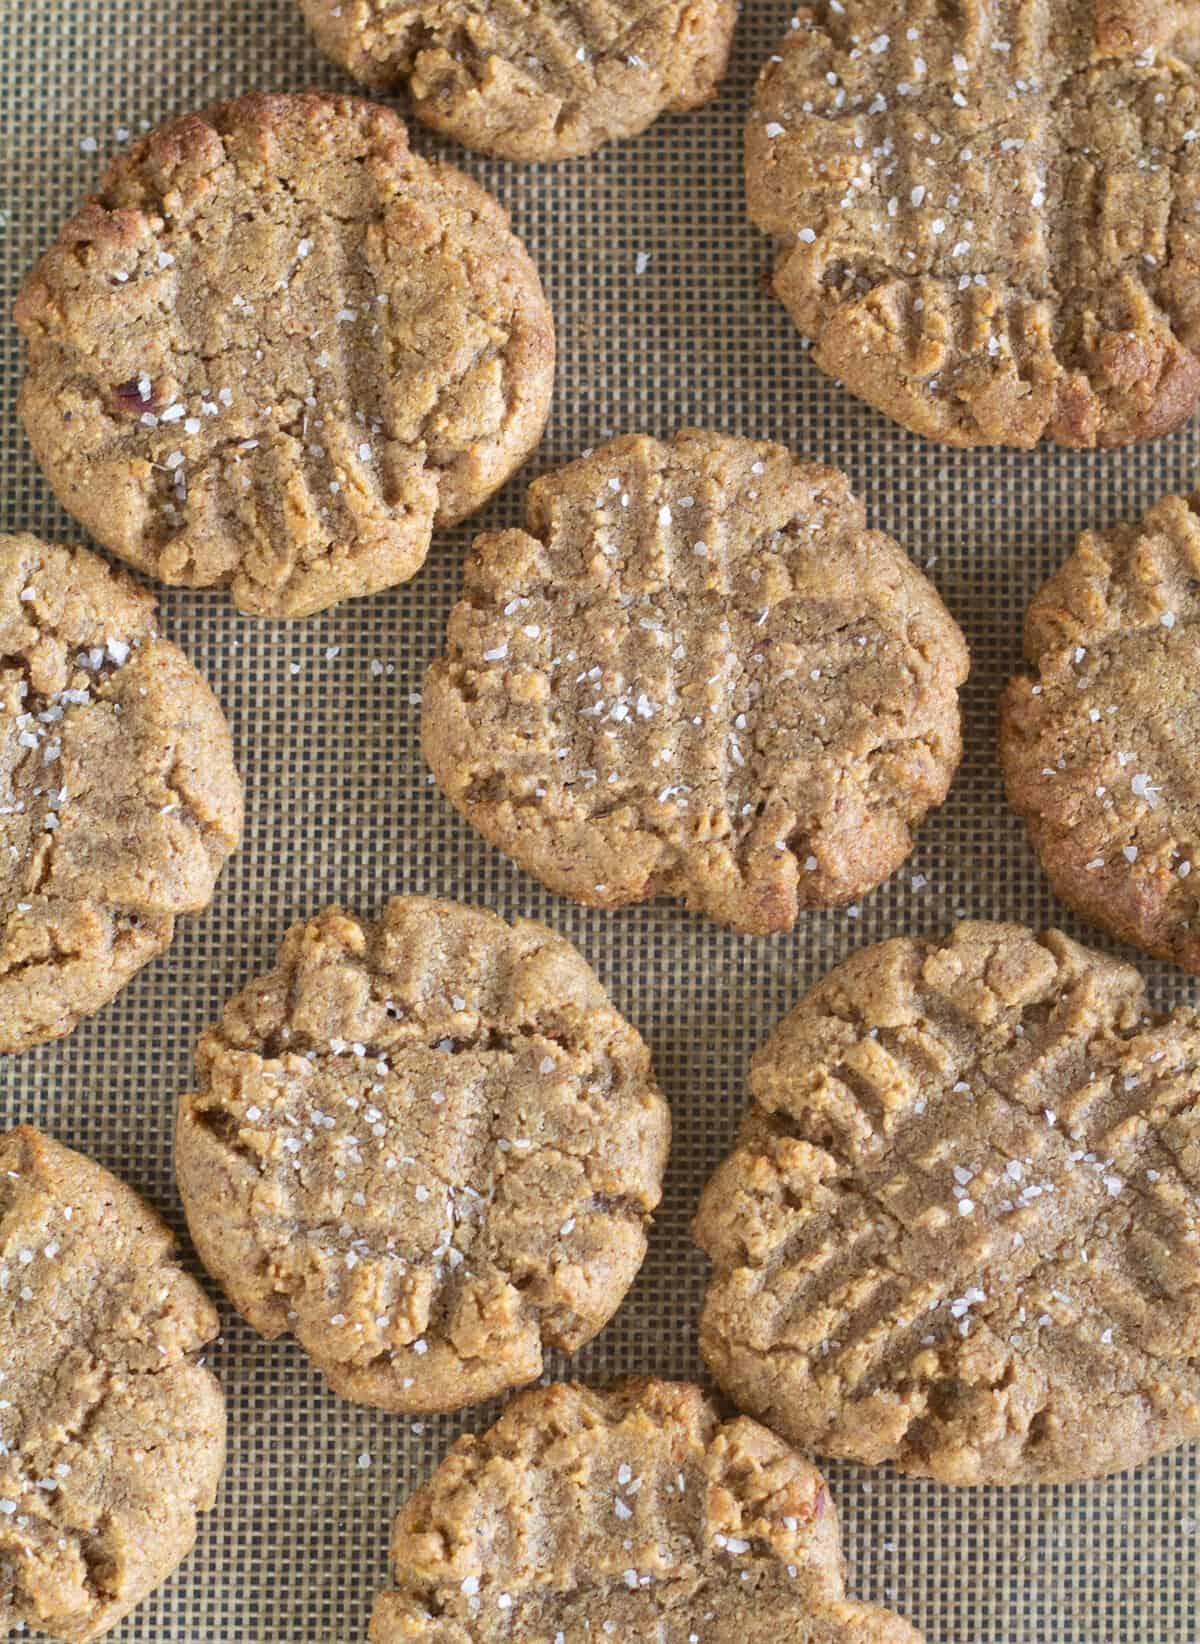 Overhead shot of cookies on baking sheet with sea salt